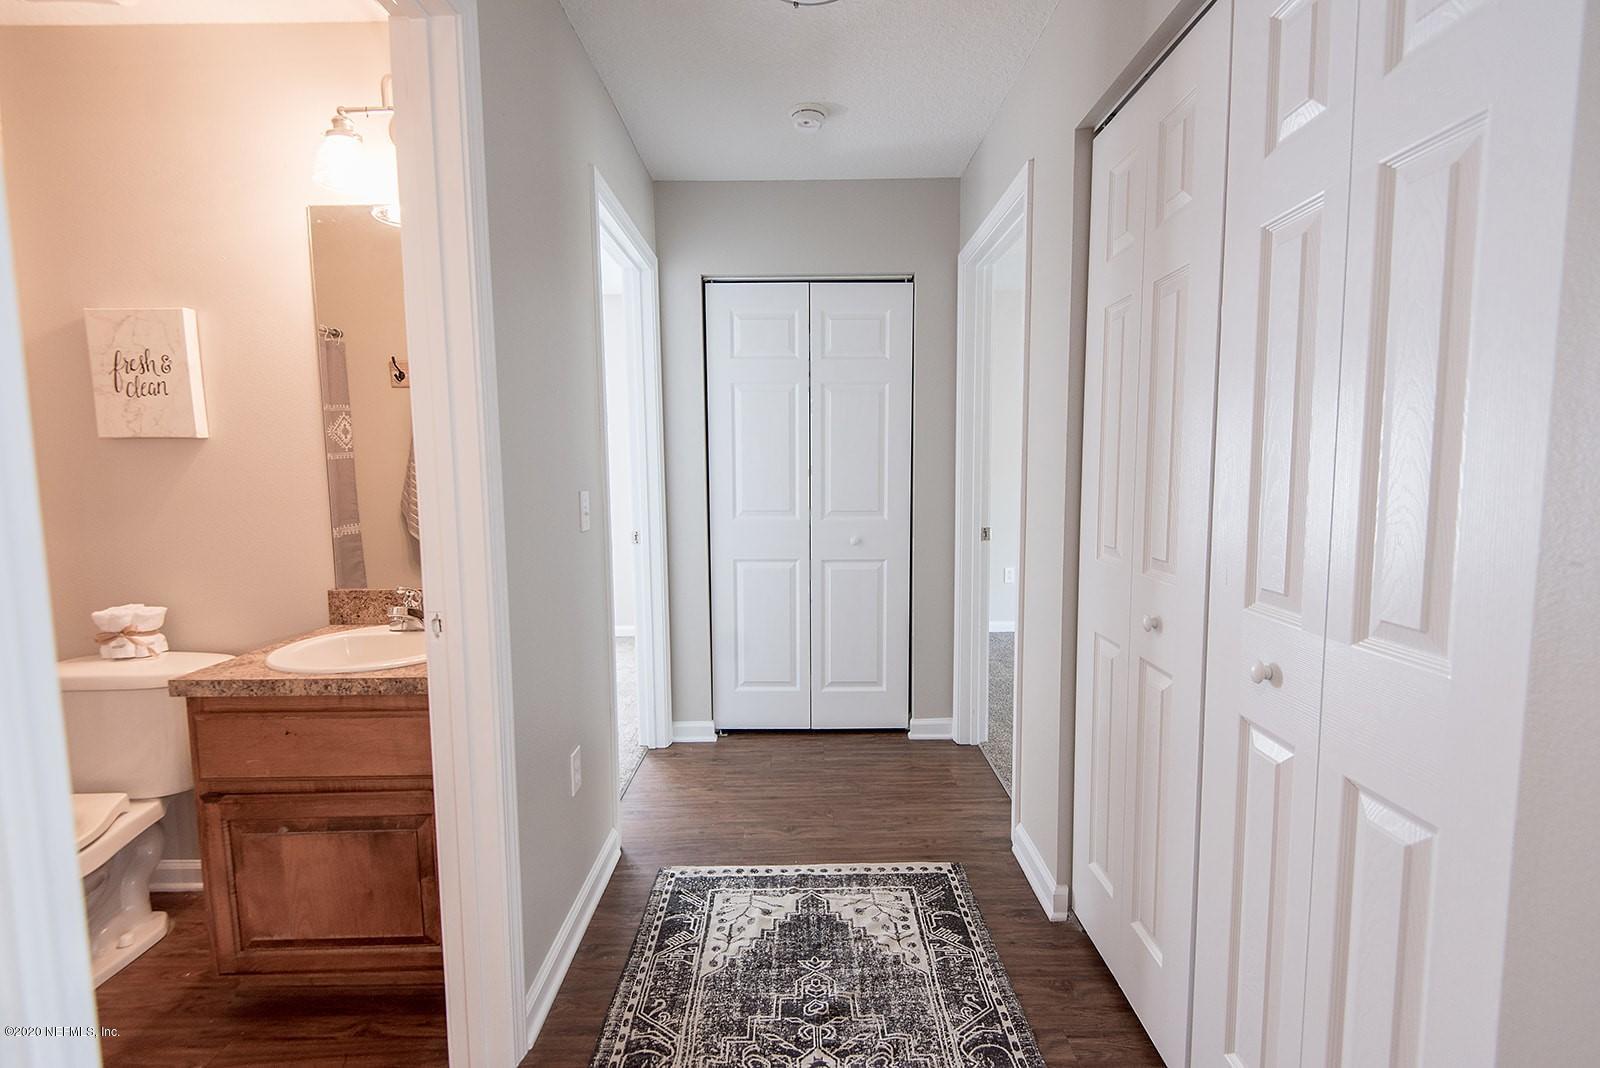 226 BRADFORD, STARKE, FLORIDA 32091, 3 Bedrooms Bedrooms, ,2 BathroomsBathrooms,Residential,For sale,BRADFORD,1080080